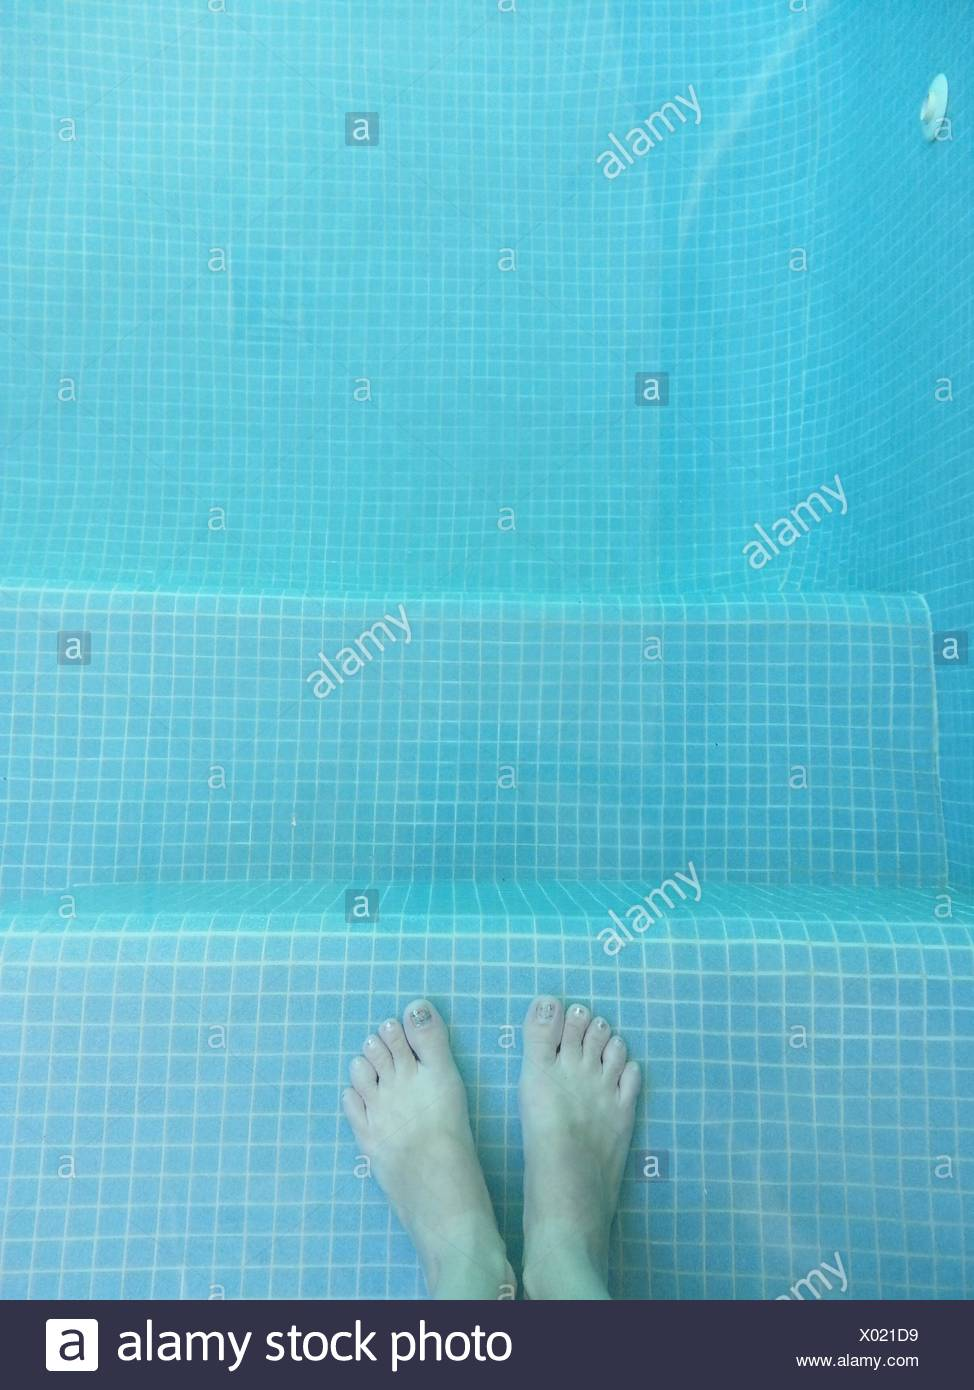 Boy's feet in swimming pool - Stock Image